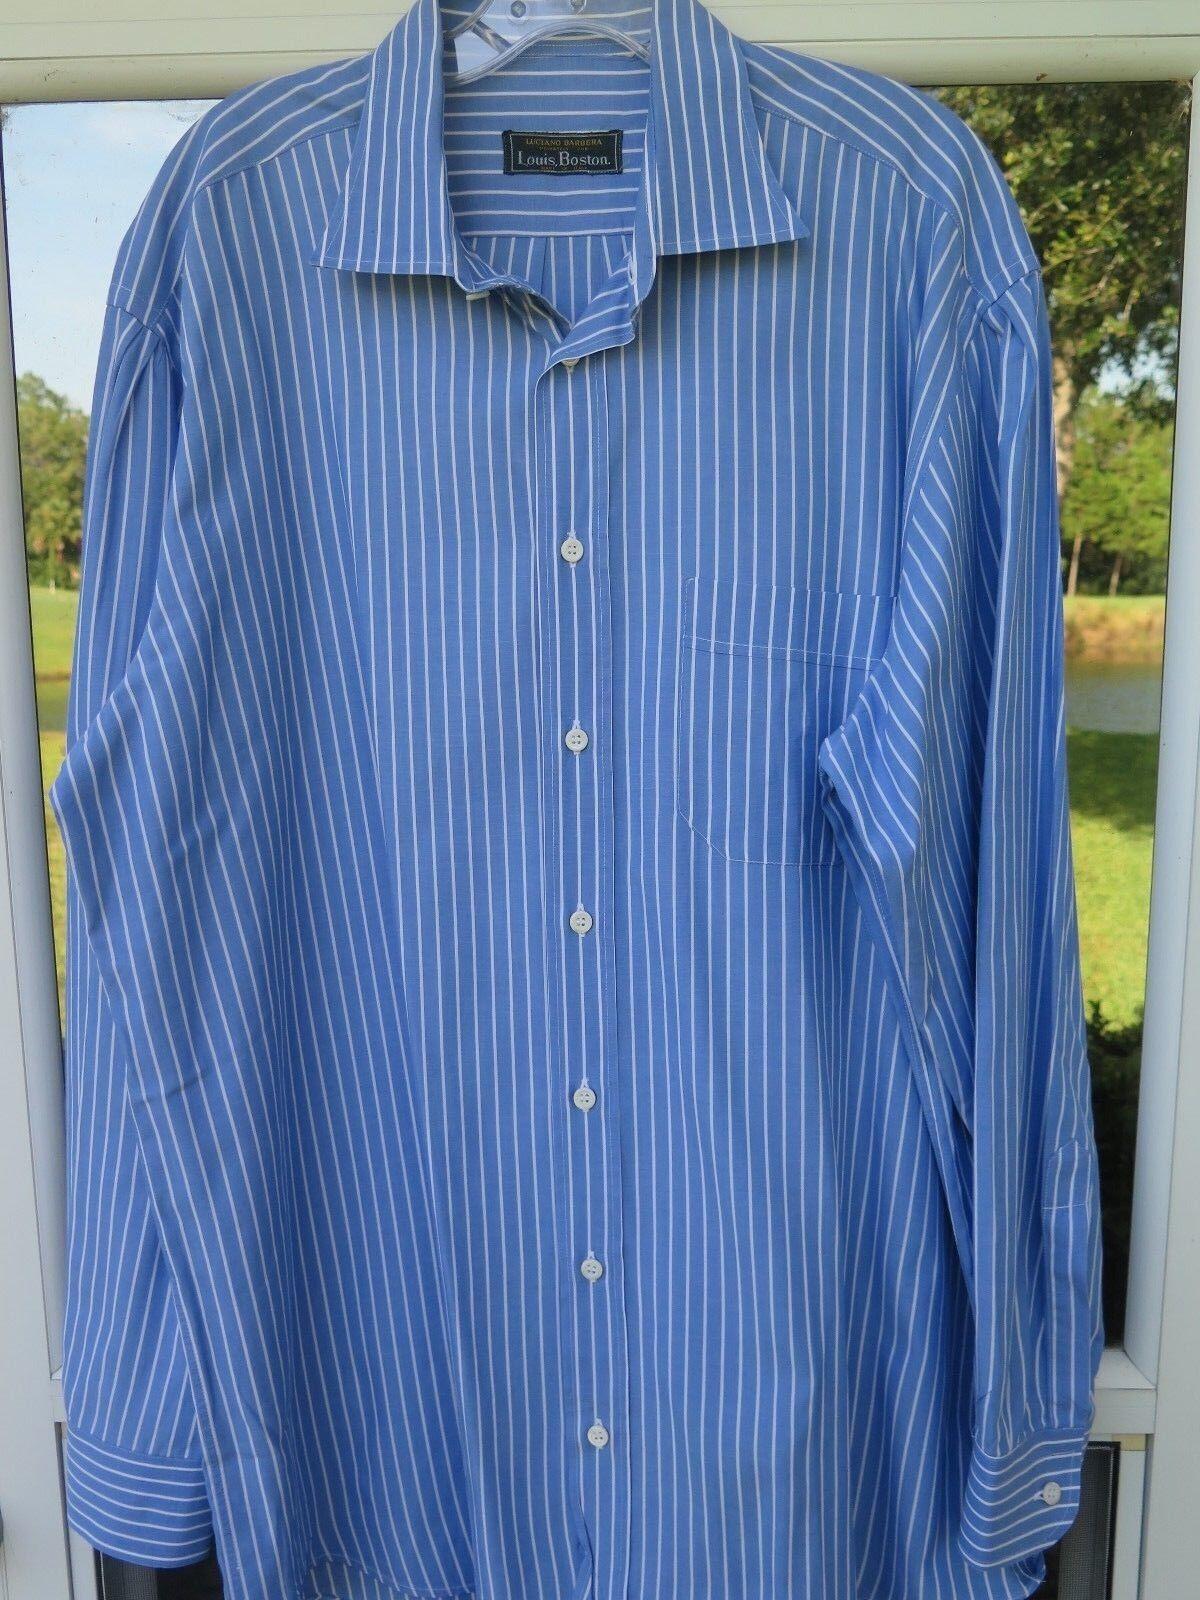 Luciano Barbera Louis Boston Men's bluee White Striped Italian Casual Shirt Large